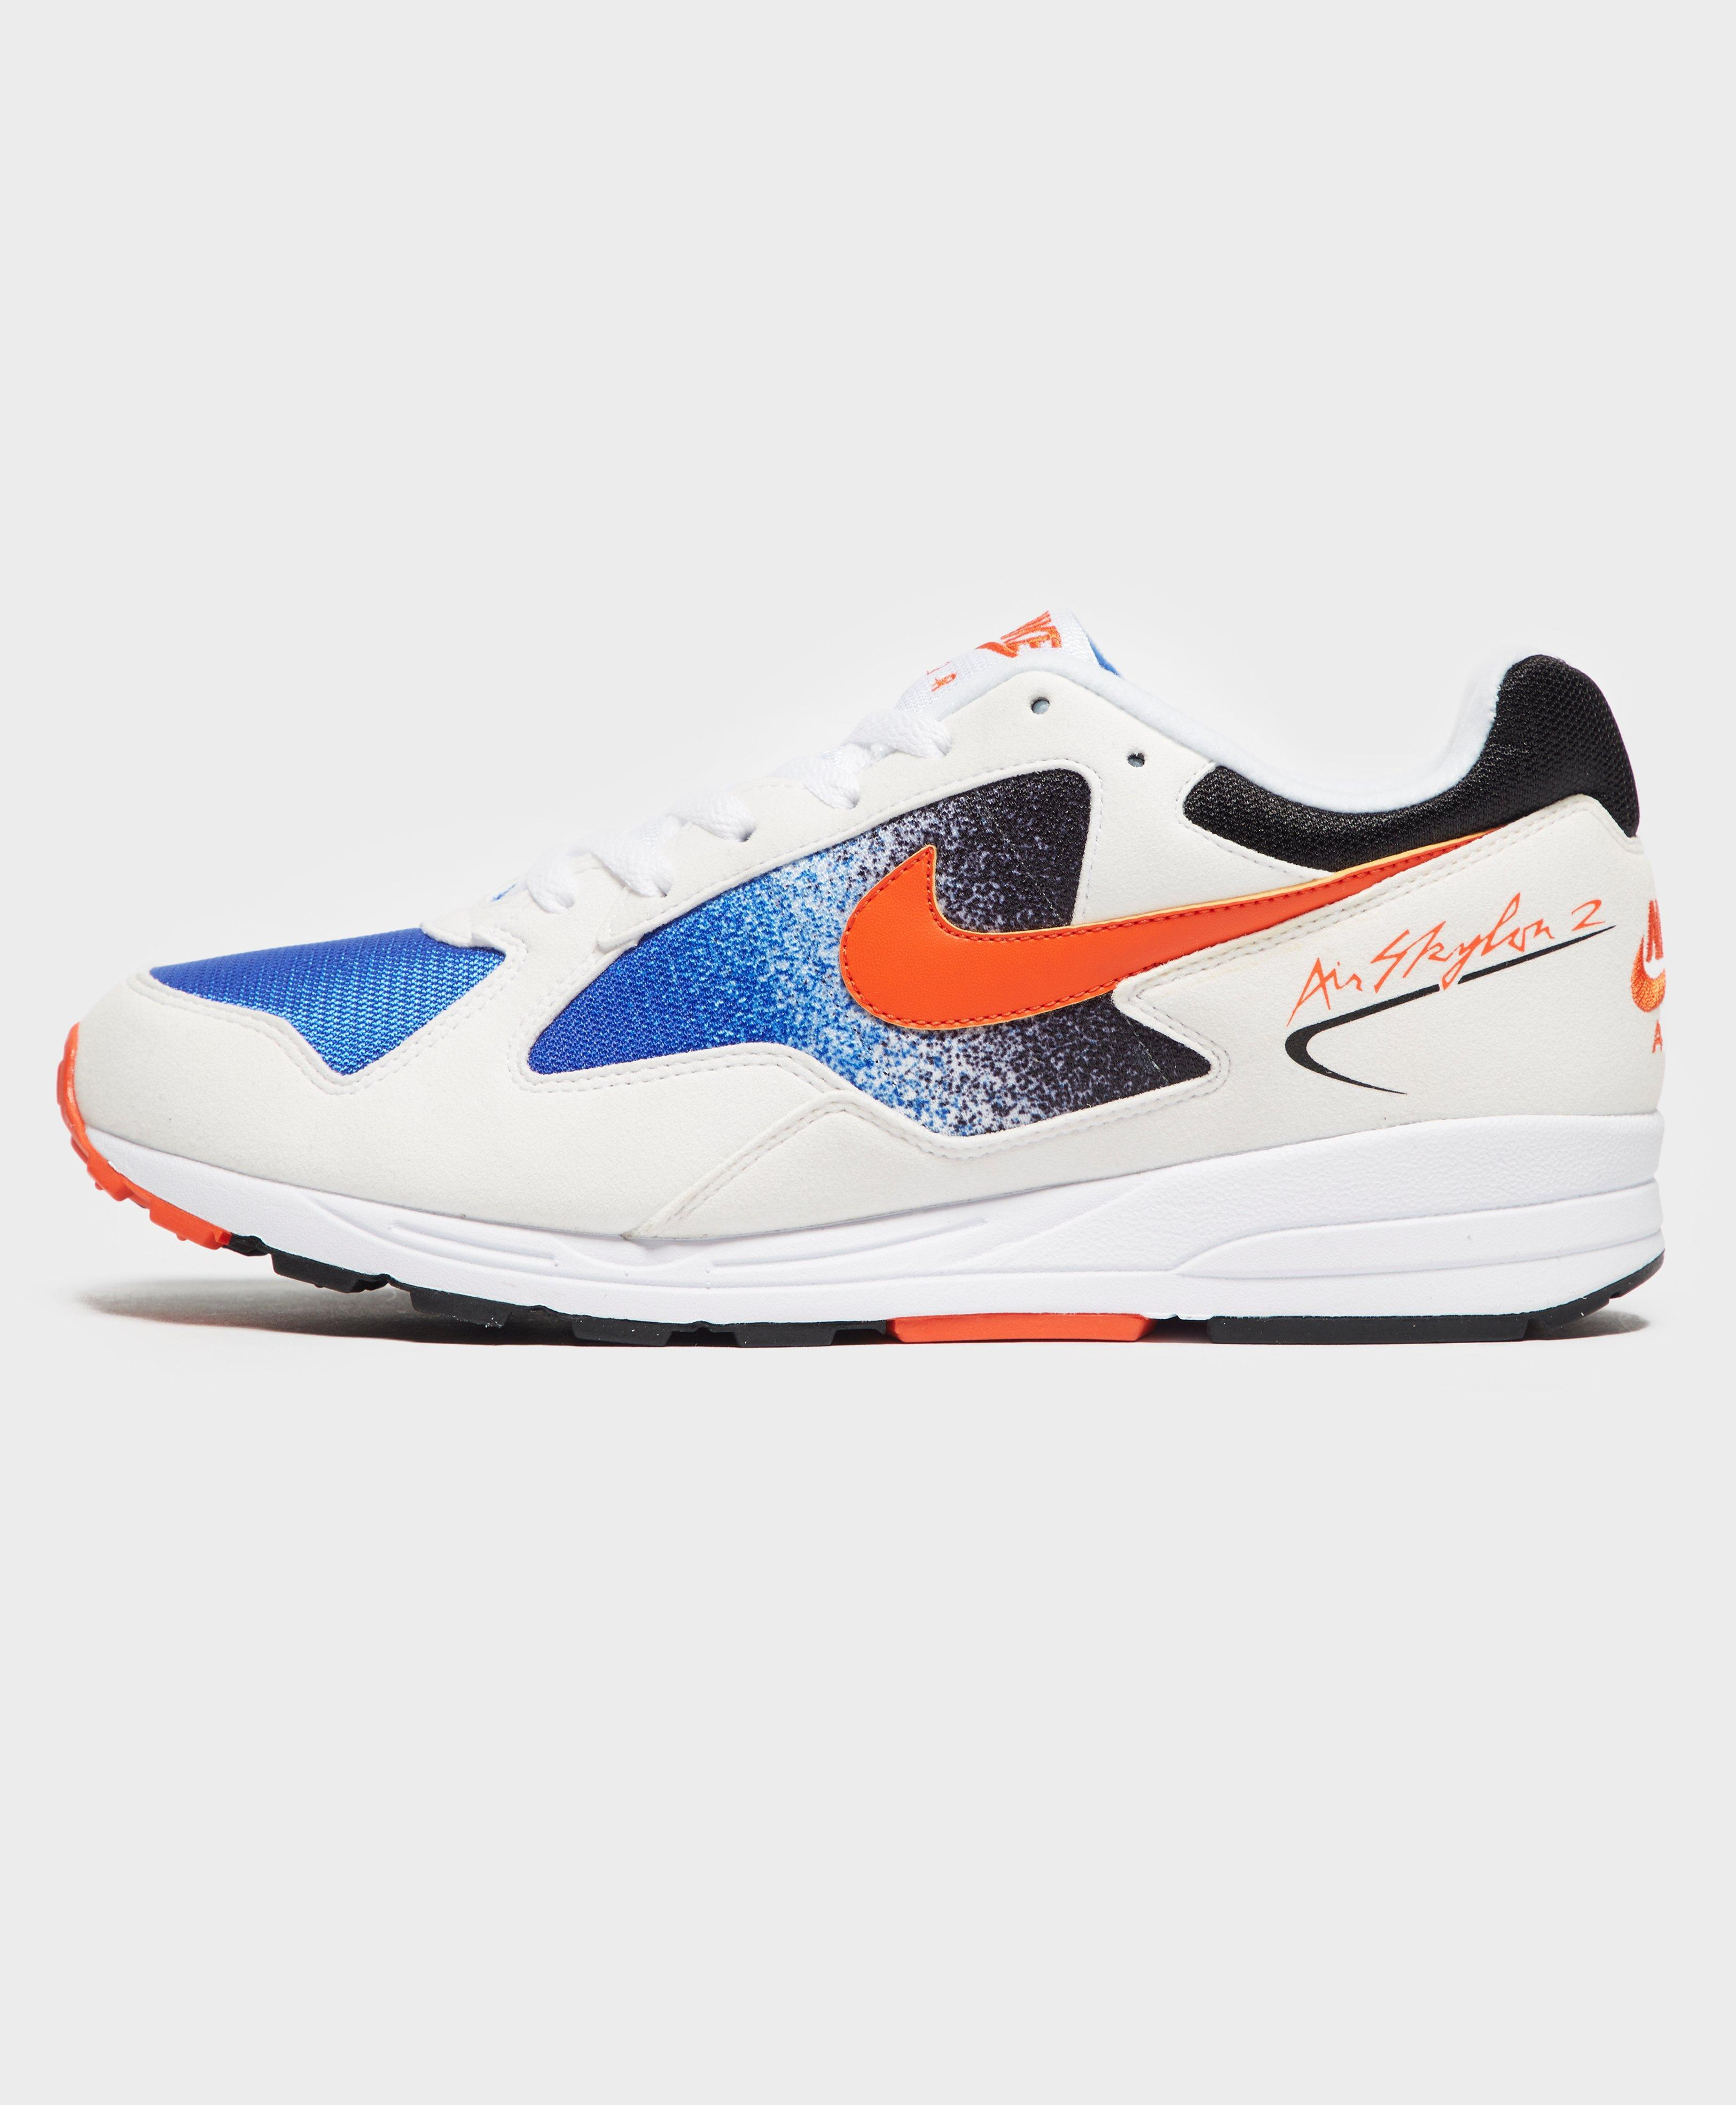 103ceb164a6 Nike Air Skylon Ii in Blue for Men - Lyst